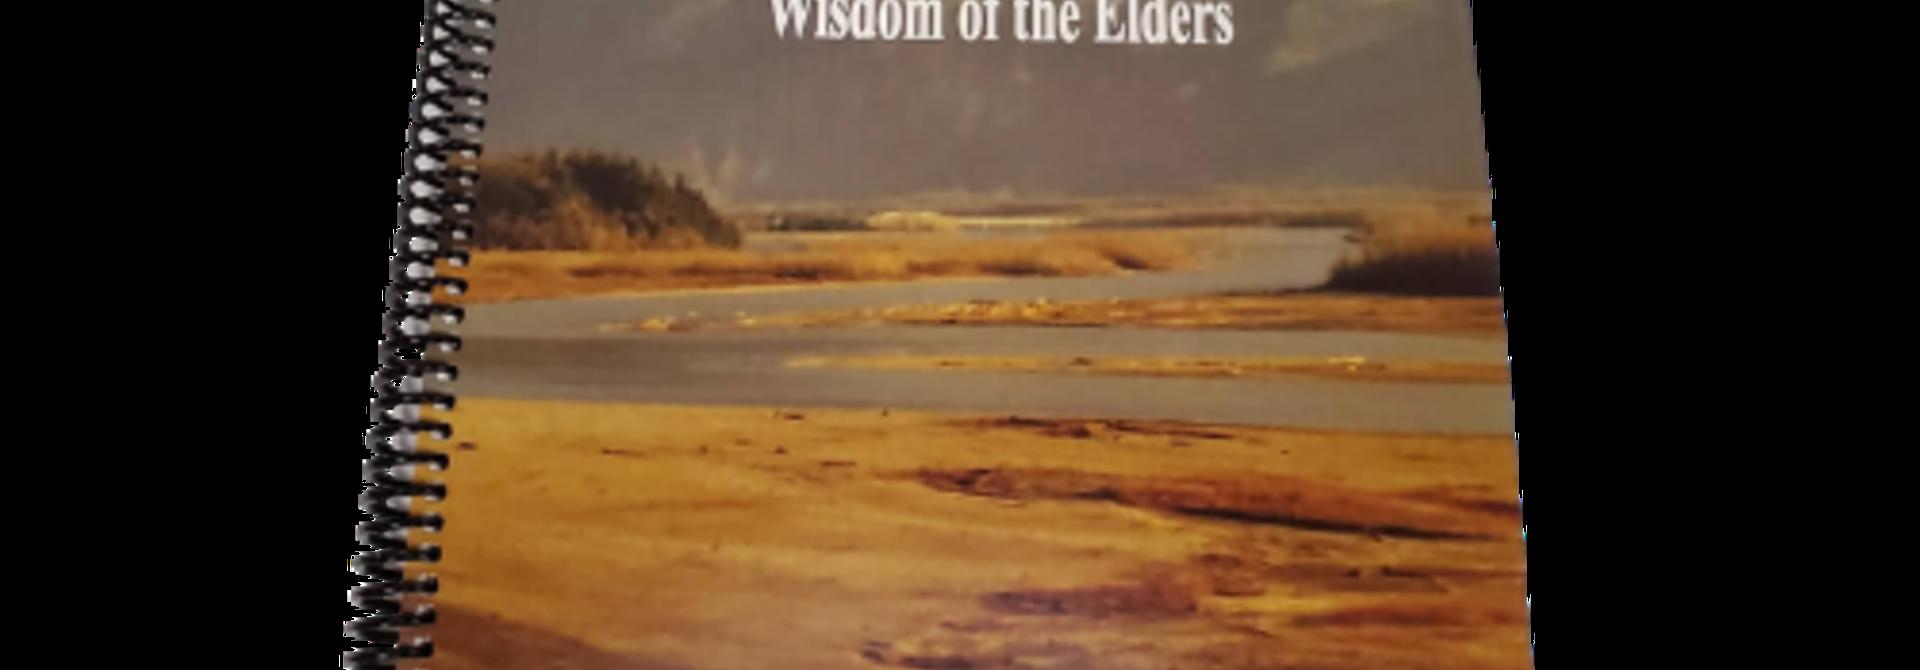 Wisdom of the Elders -Halq'emeylem Language